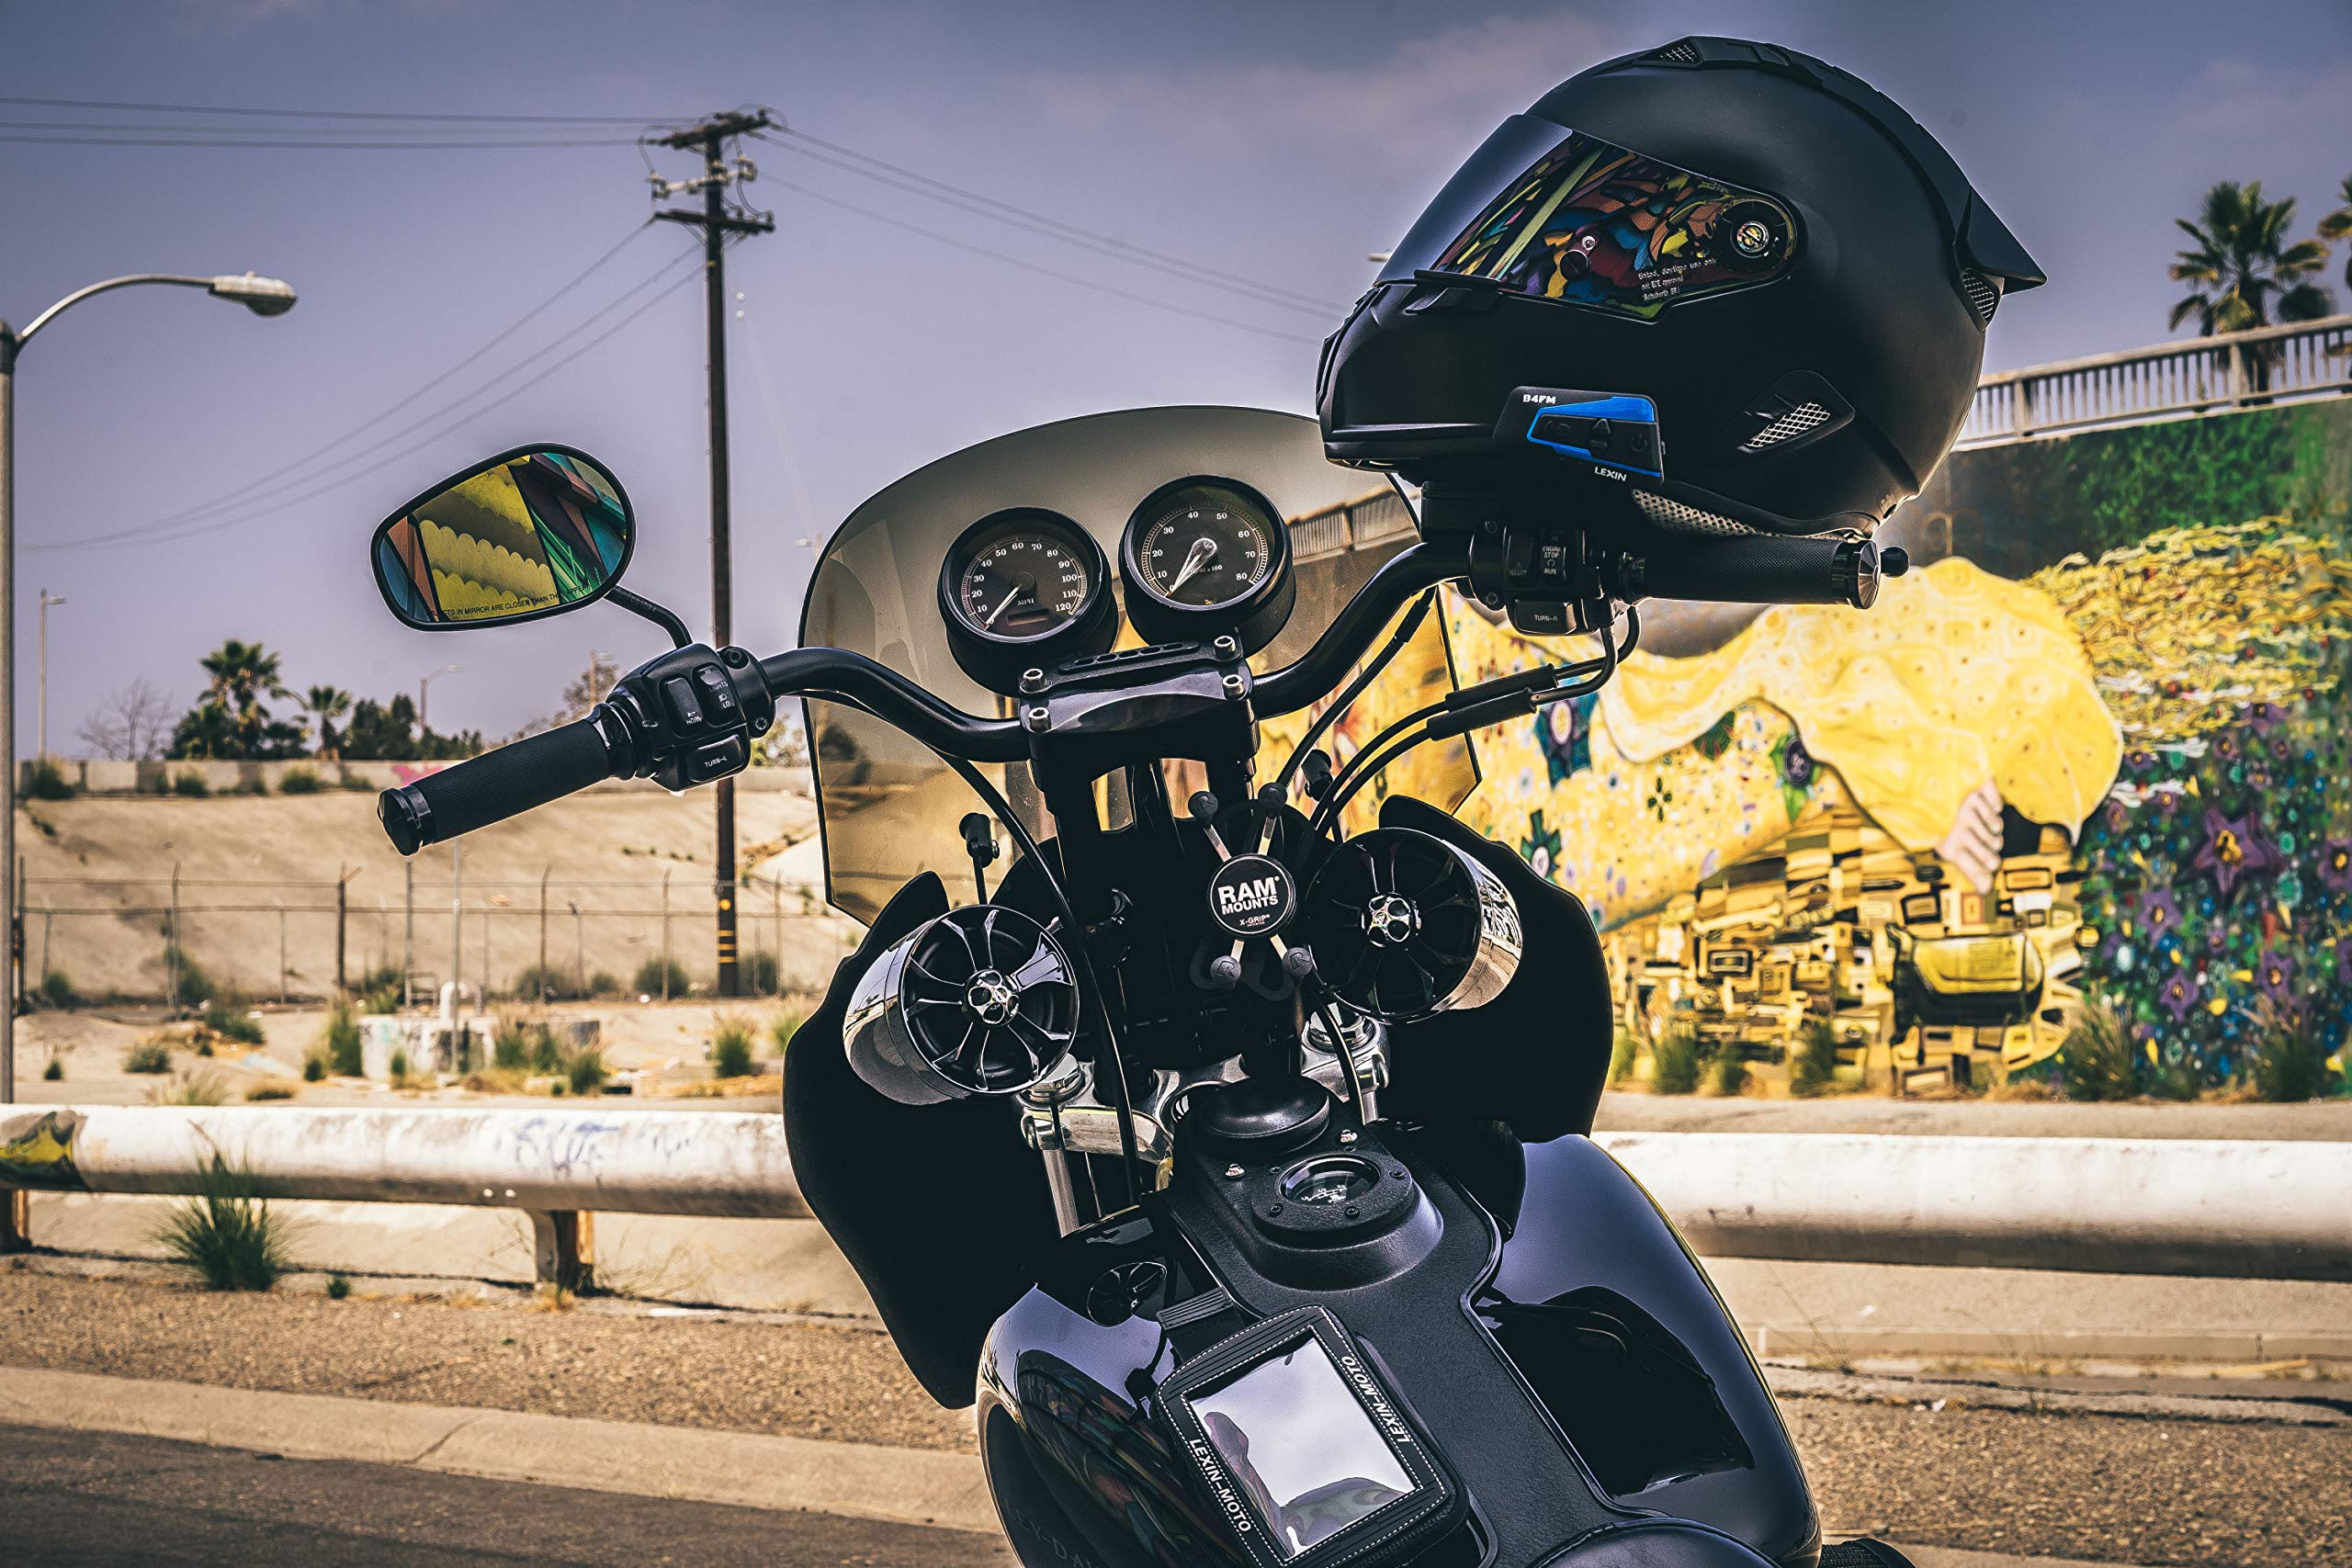 6740e46f2fa LEXIN 2x B4FM 4 Way BT Interphone Bluetooth Motorcycle Helmet Intercom,  Universal Wireless Headset, Motorbike Communication System with Speakers  headphones ...